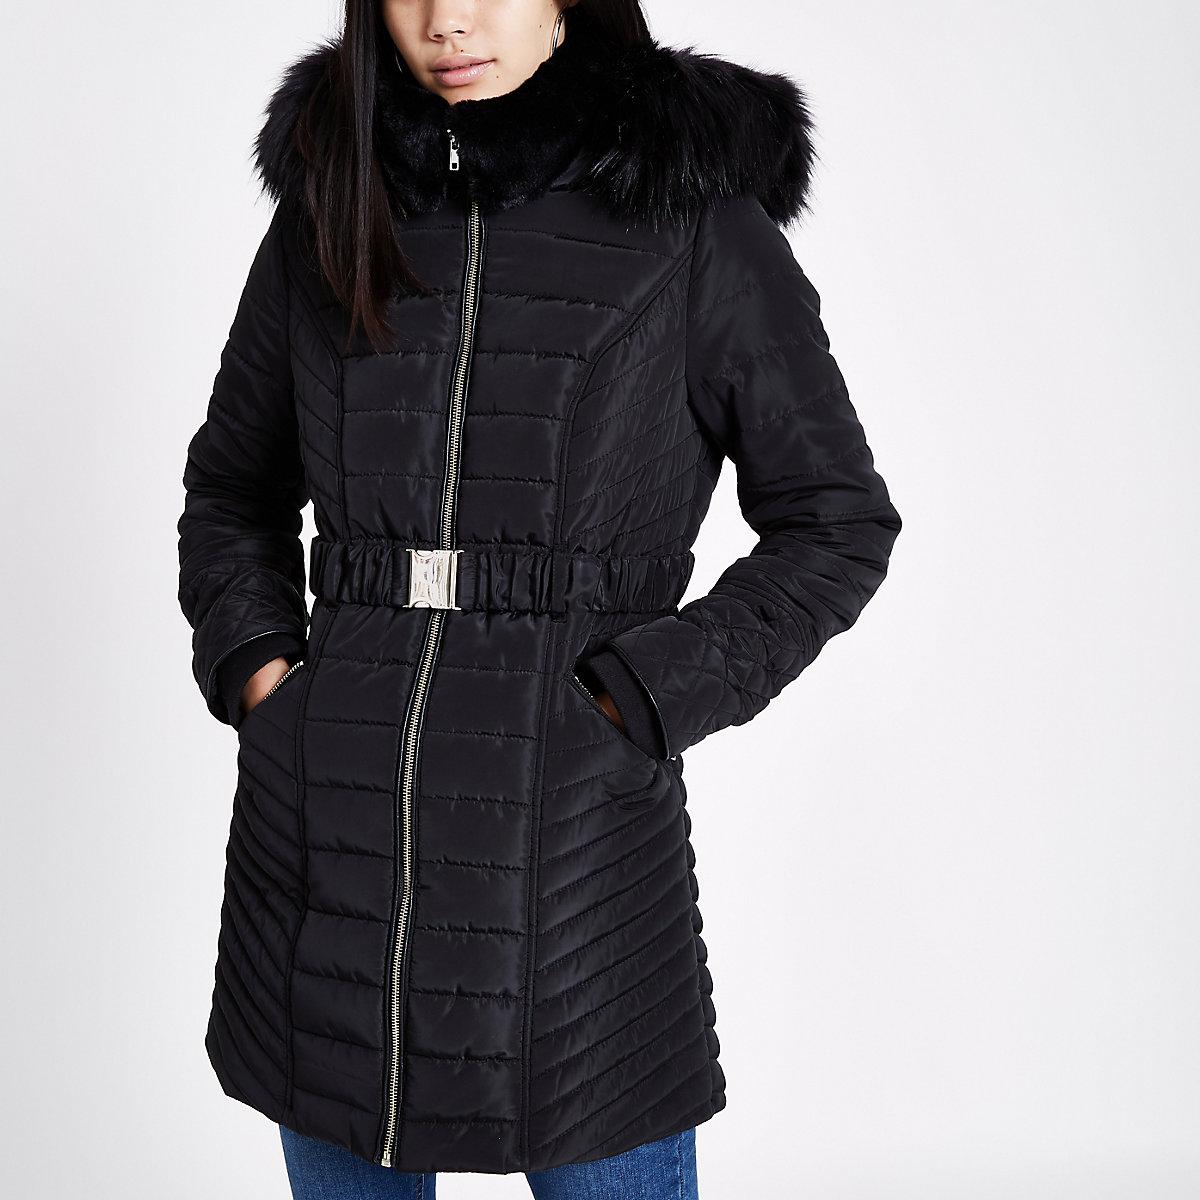 Black faux fur trim belted puffer jacket